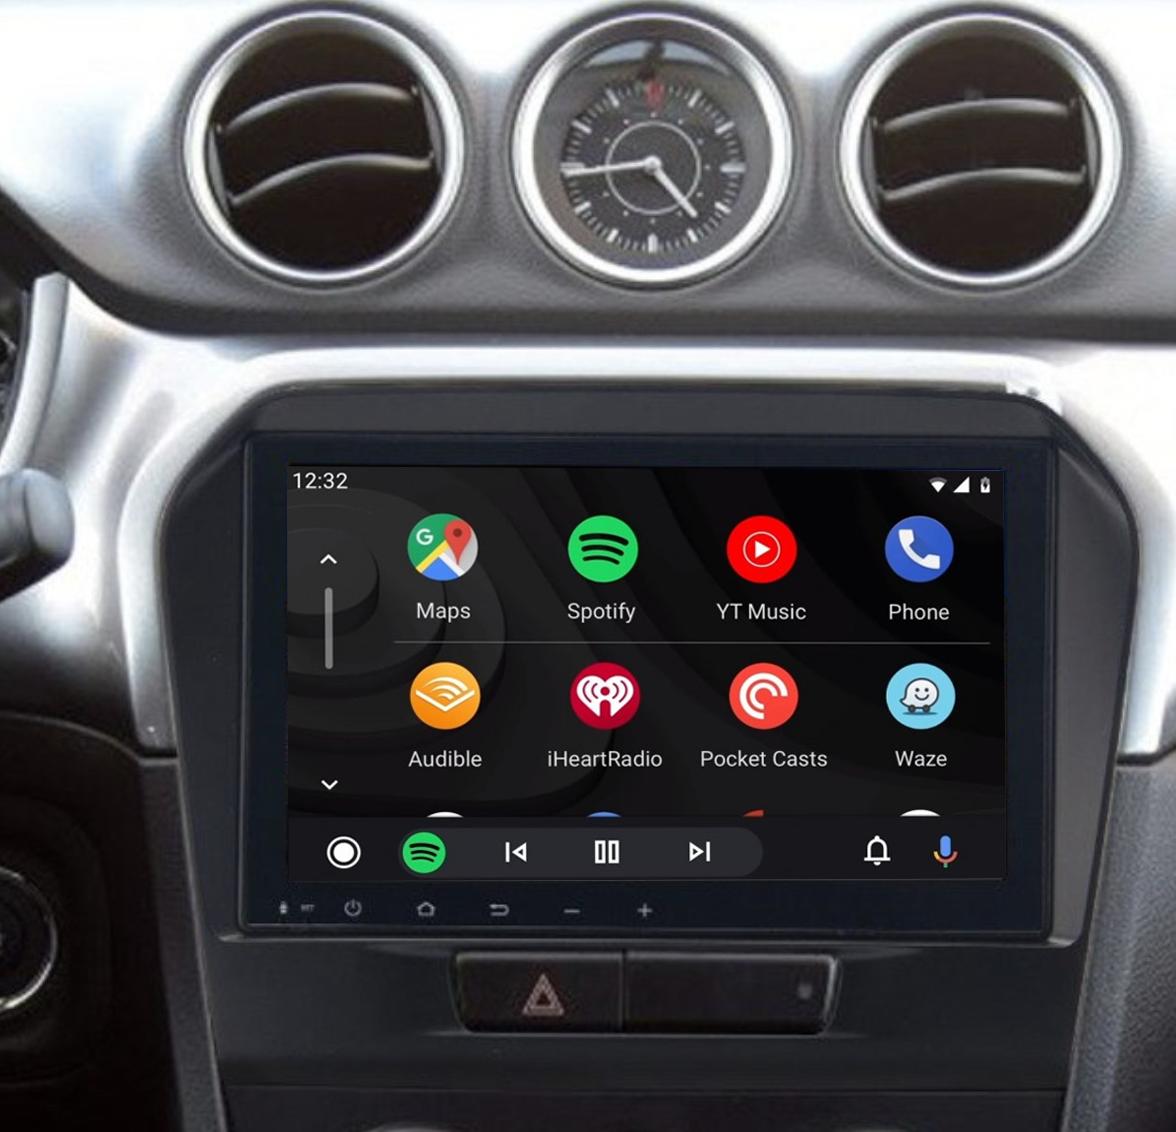 Ecran tactile QLED Android 11.0 + Apple Carplay sans fil Suzuki Vitara de 04/2015 à 2020